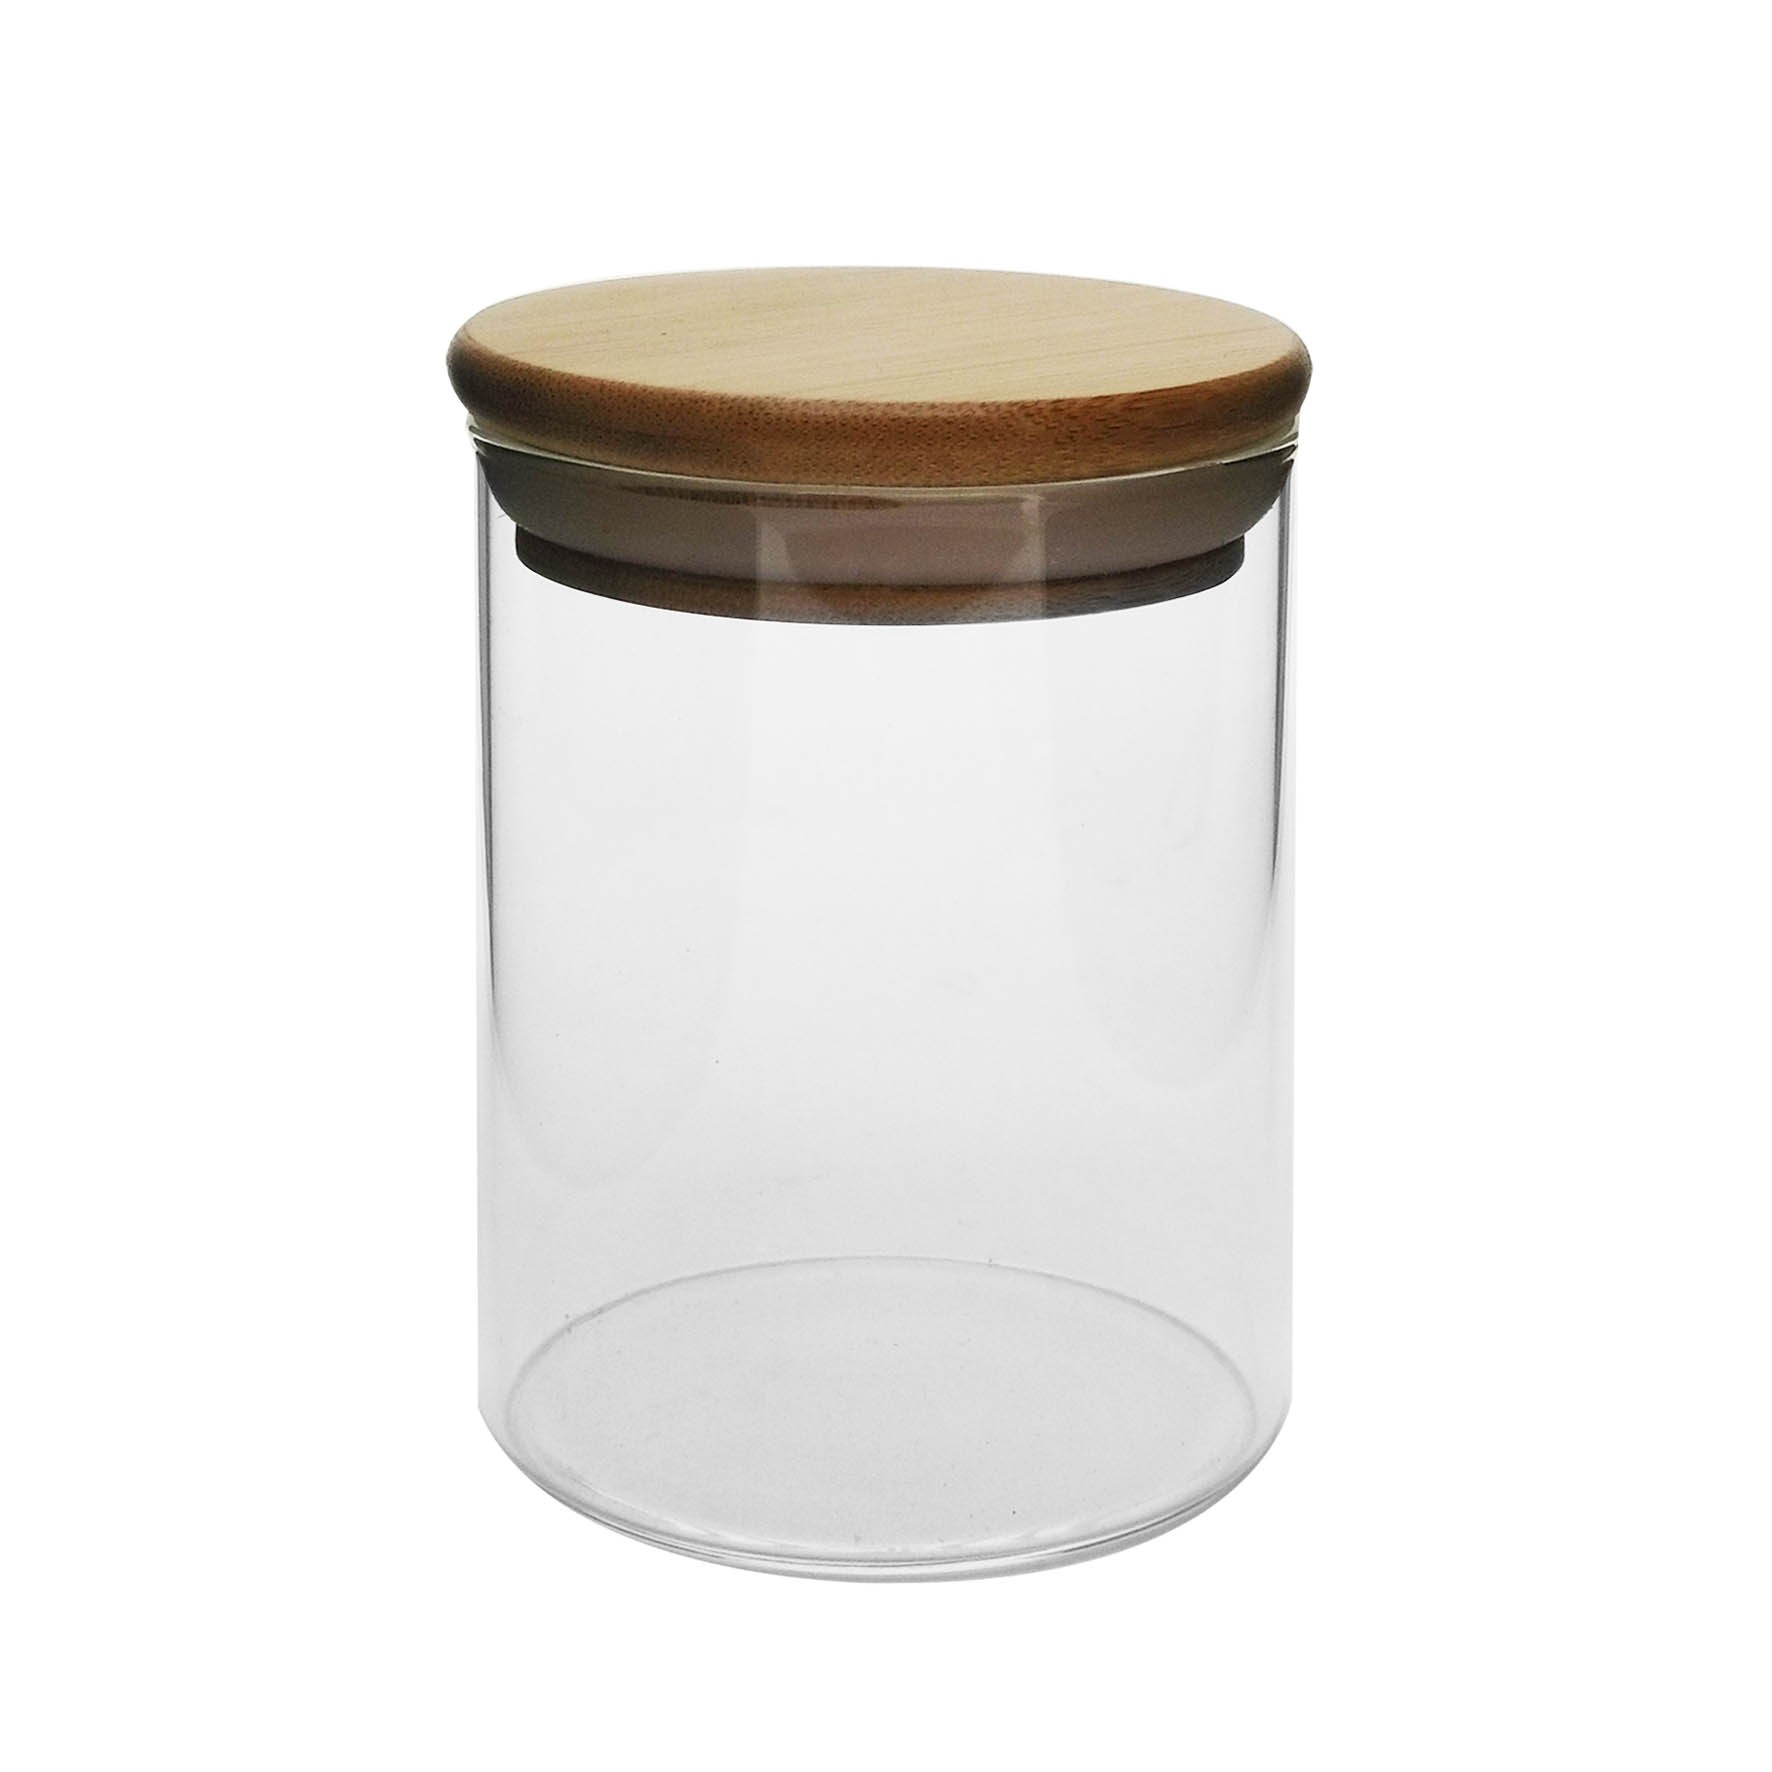 Pote de Vidro Redondo 150ml com Tampa Bambu Transparente - Yangzi